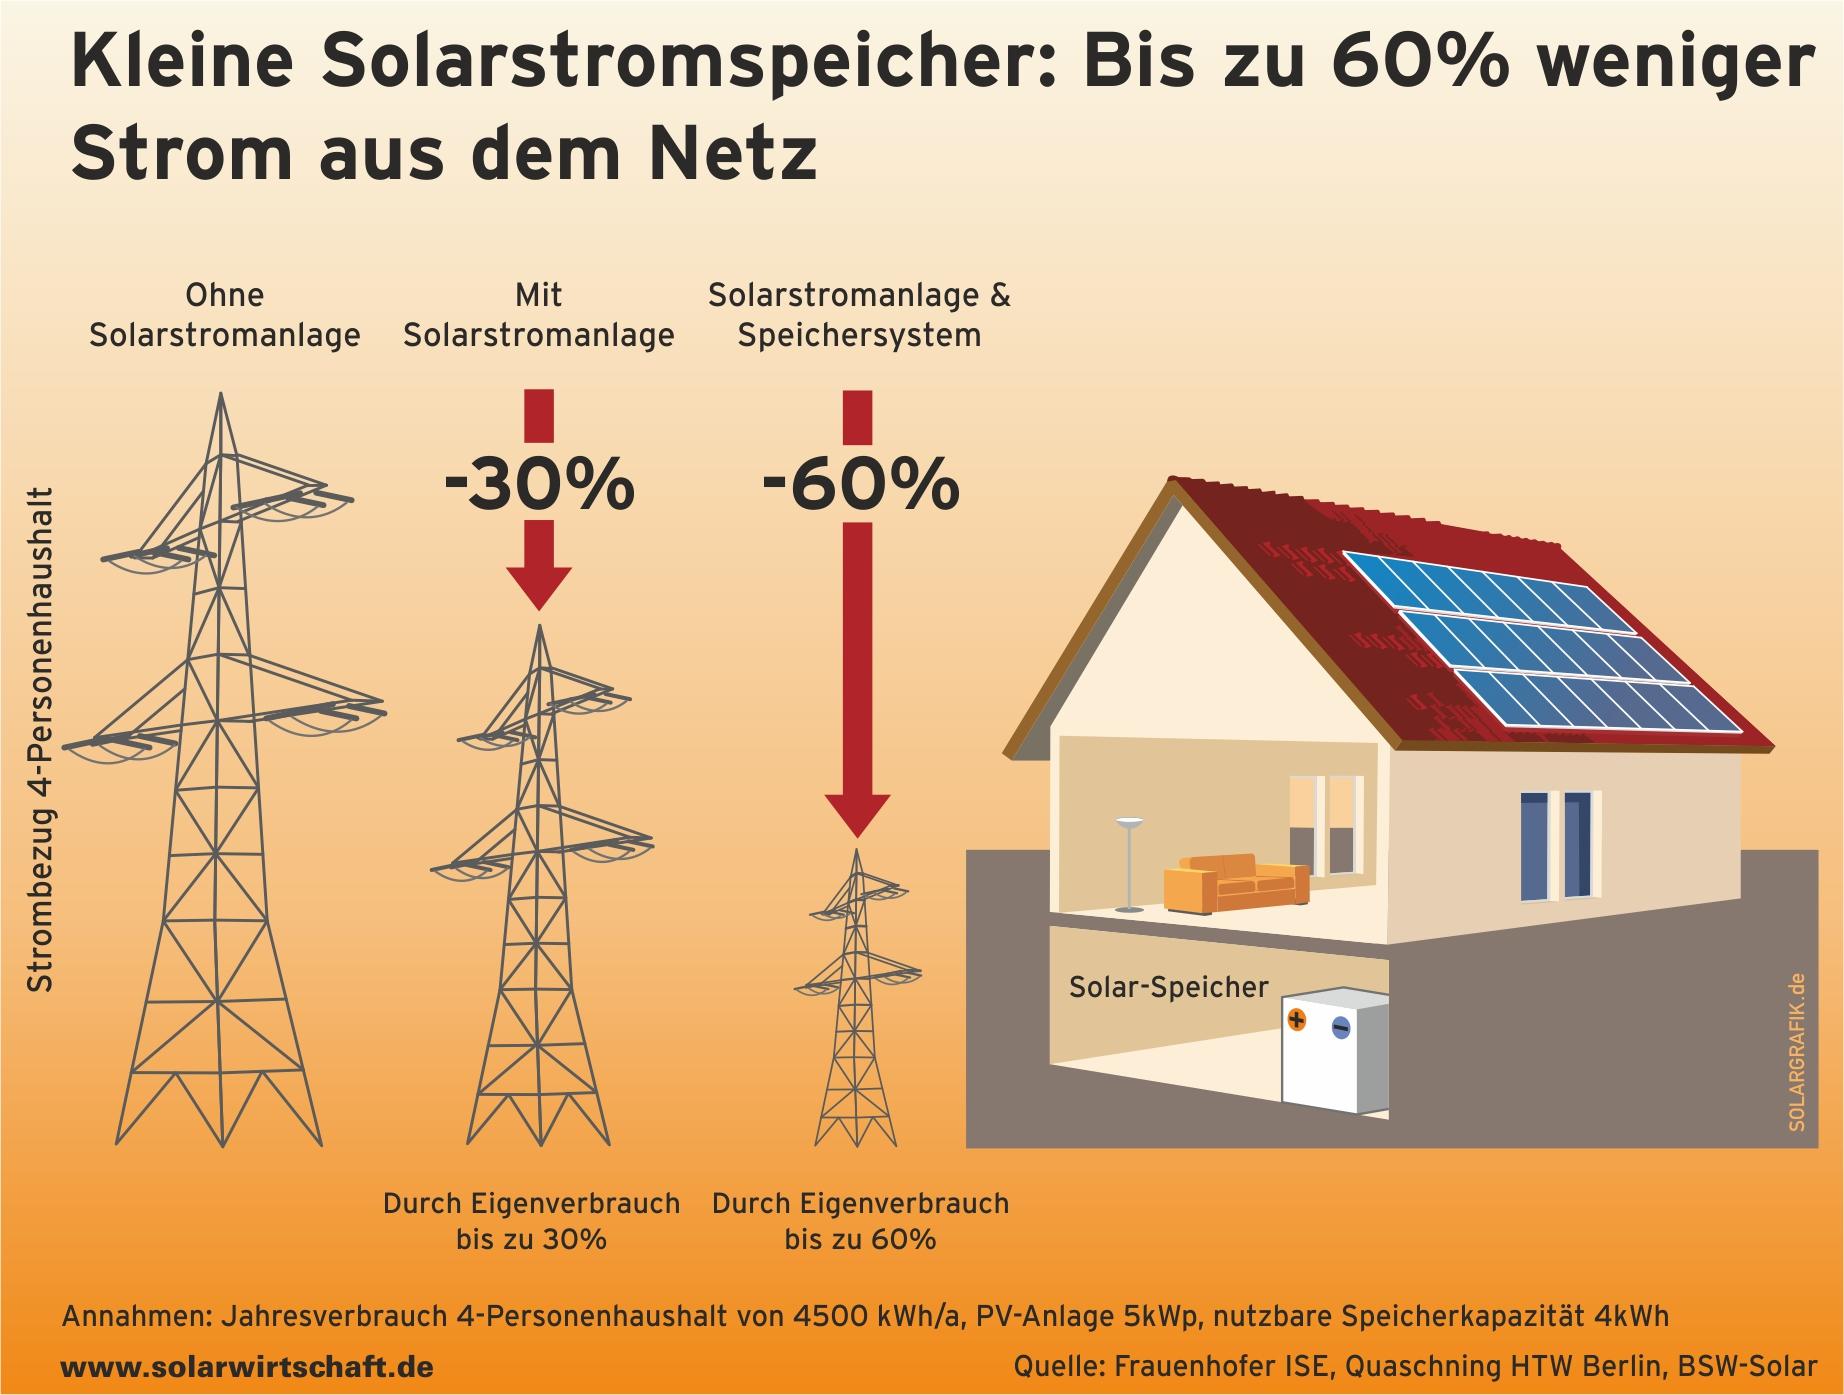 Speichersystem photovoltaik